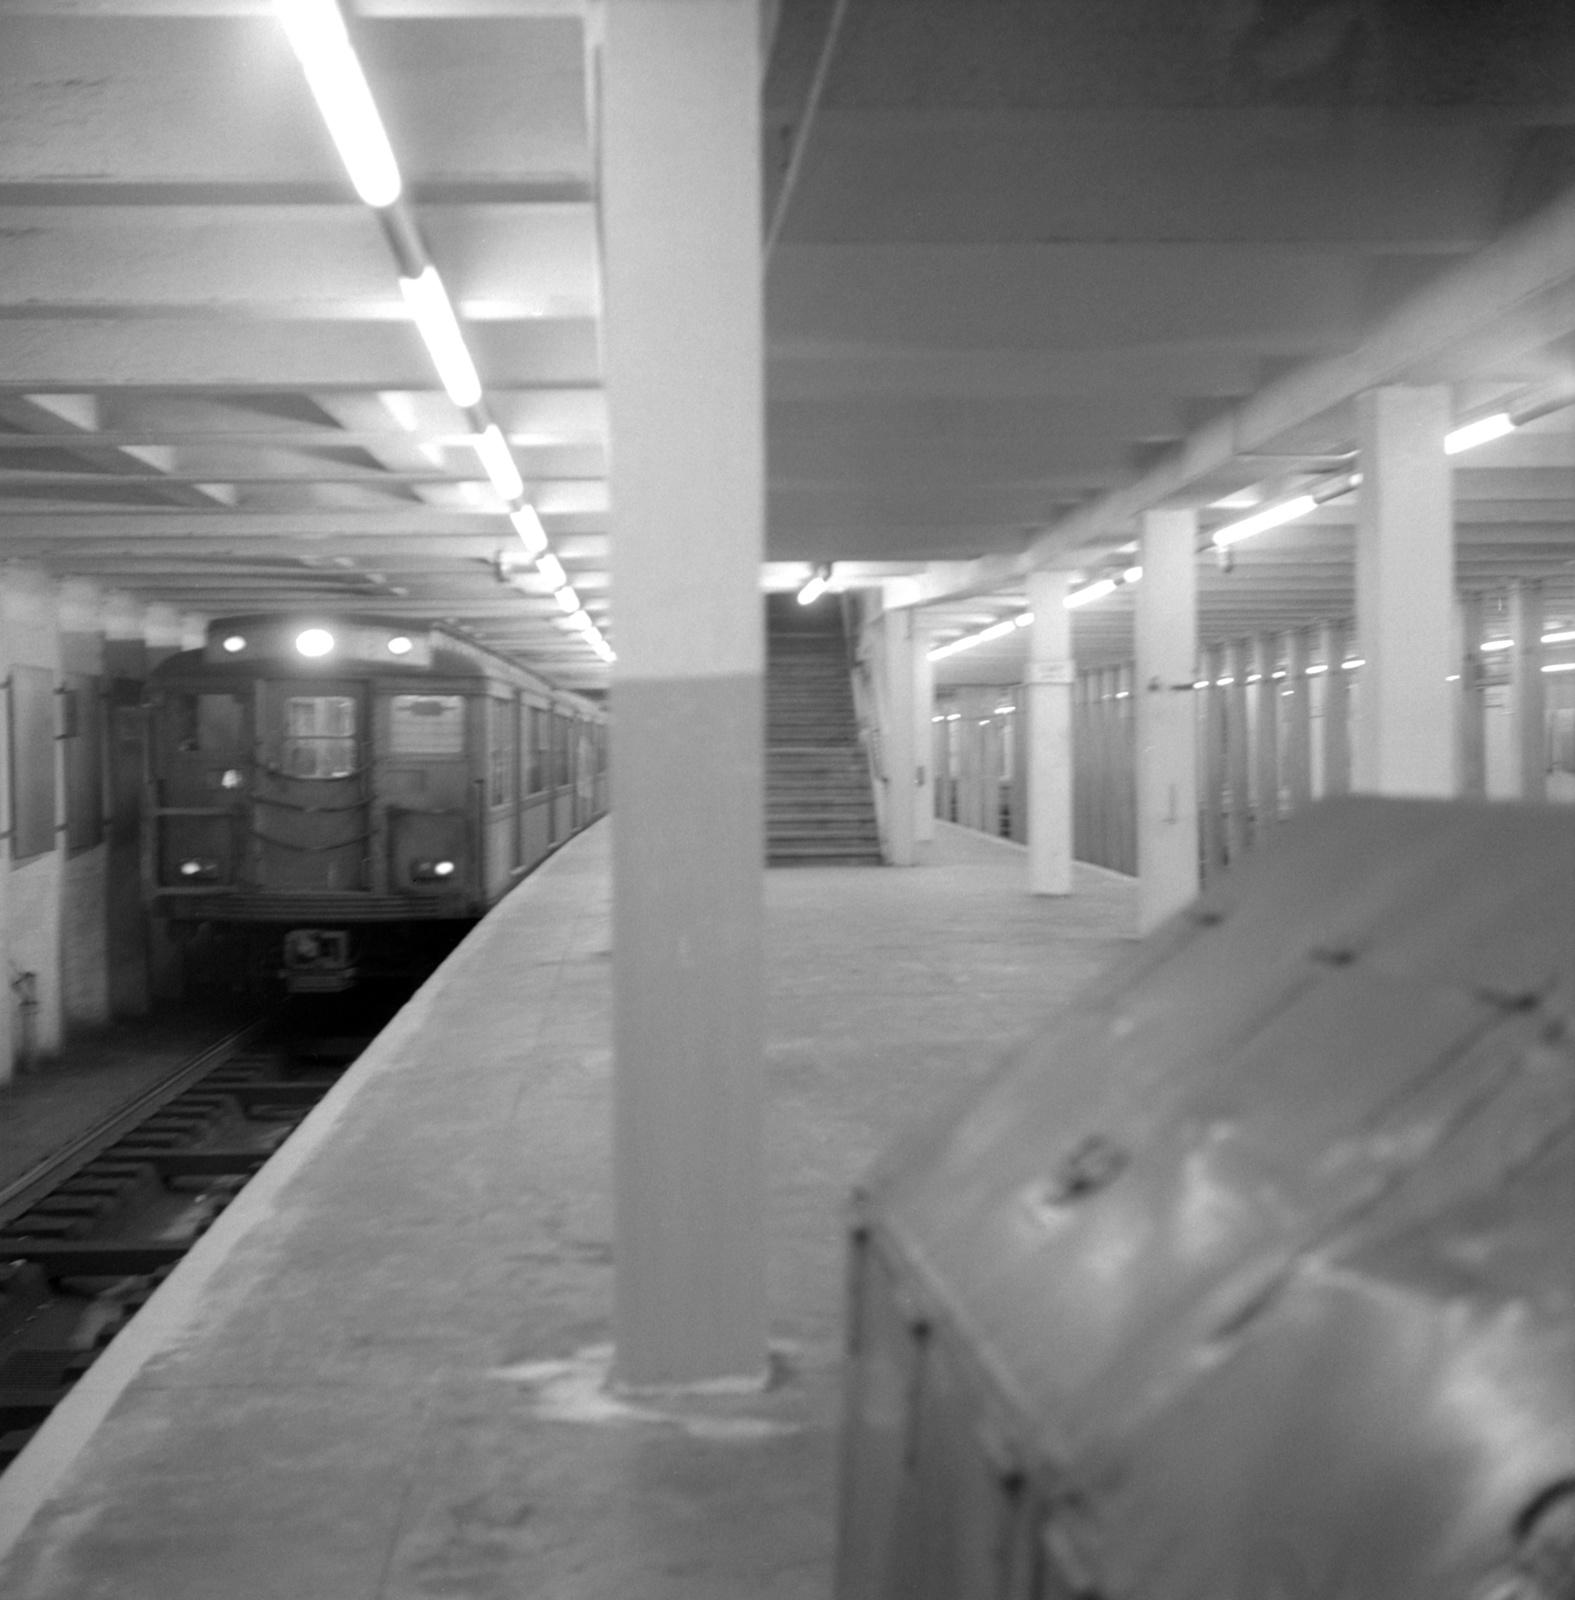 (506k, 1575x1600)<br><b>Country:</b> United States<br><b>City:</b> Philadelphia, PA<br><b>System:</b> SEPTA (or Predecessor)<br><b>Line:</b> Broad Street Subway<br><b>Location:</b> Olney<br><b>Collection of:</b> David Pirmann<br><b>Date:</b> 9/24/1966<br><b>Viewed (this week/total):</b> 5 / 76